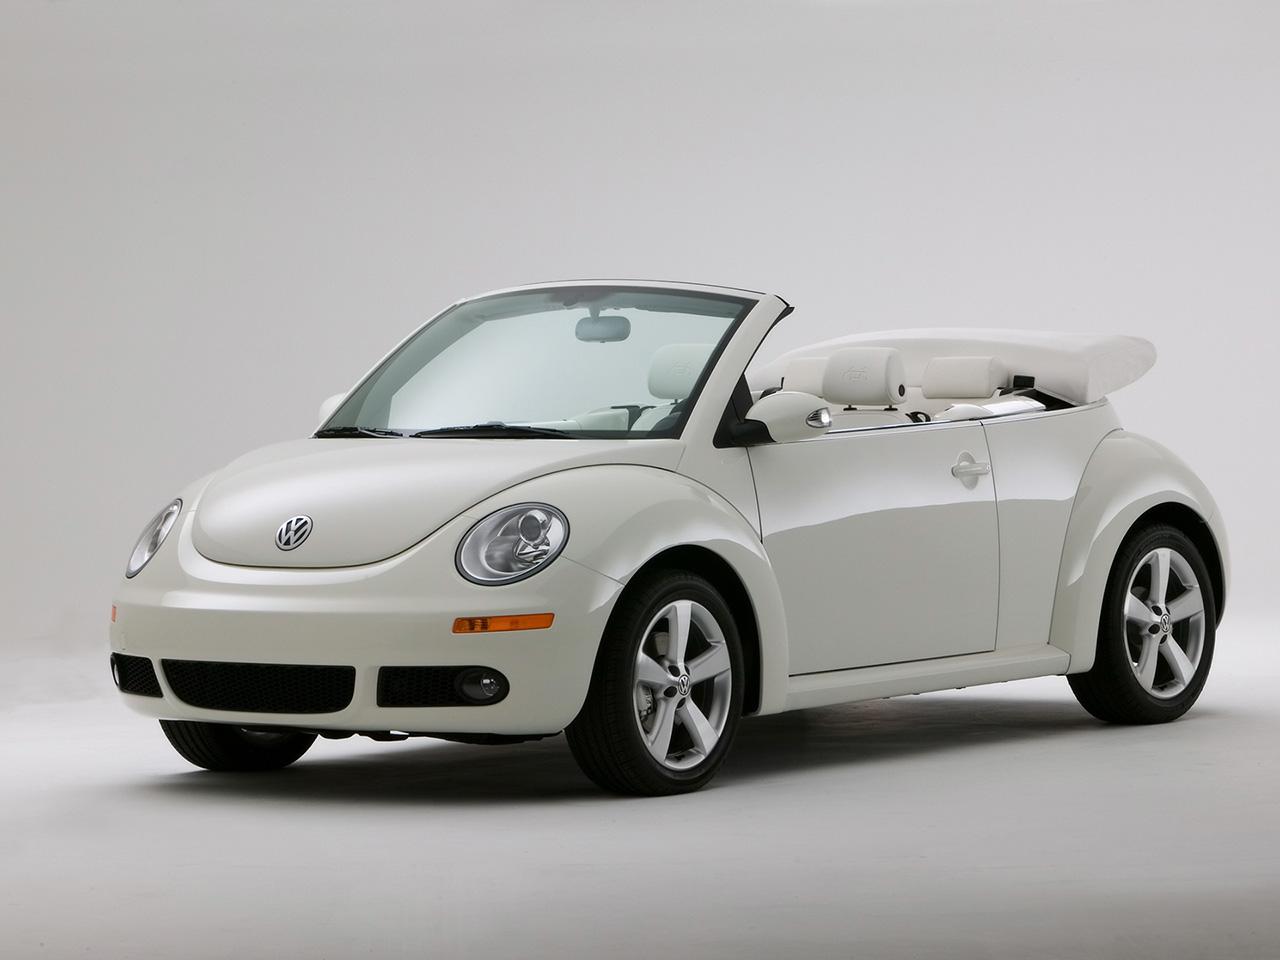 Fake Vw Beetle Cabrio Pagenstecher De Deine Automeile